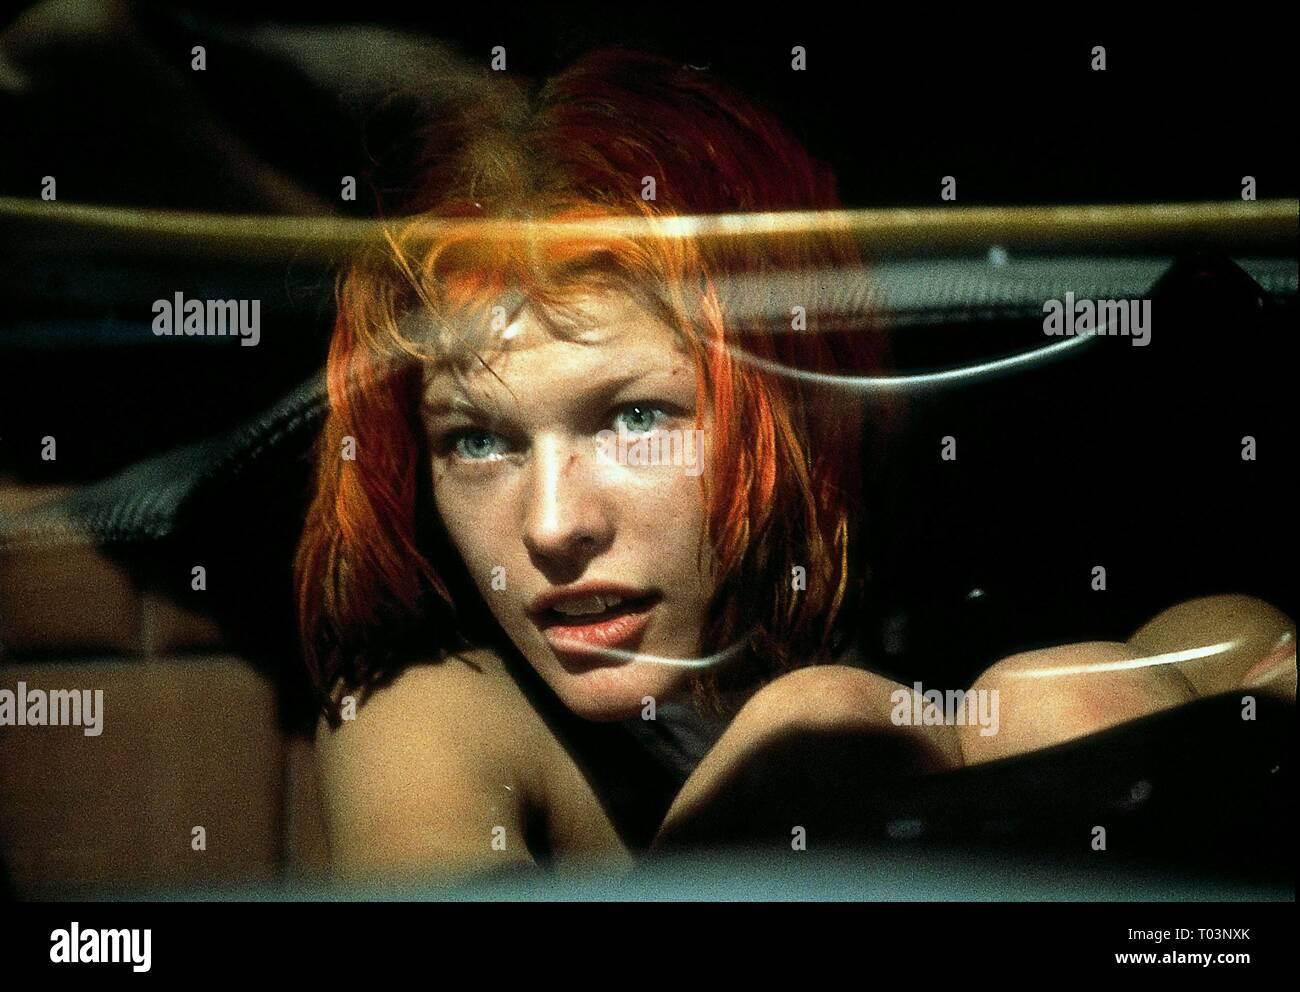 MILLA JOVOVICH, THE FIFTH ELEMENT, 1997 - Stock Image